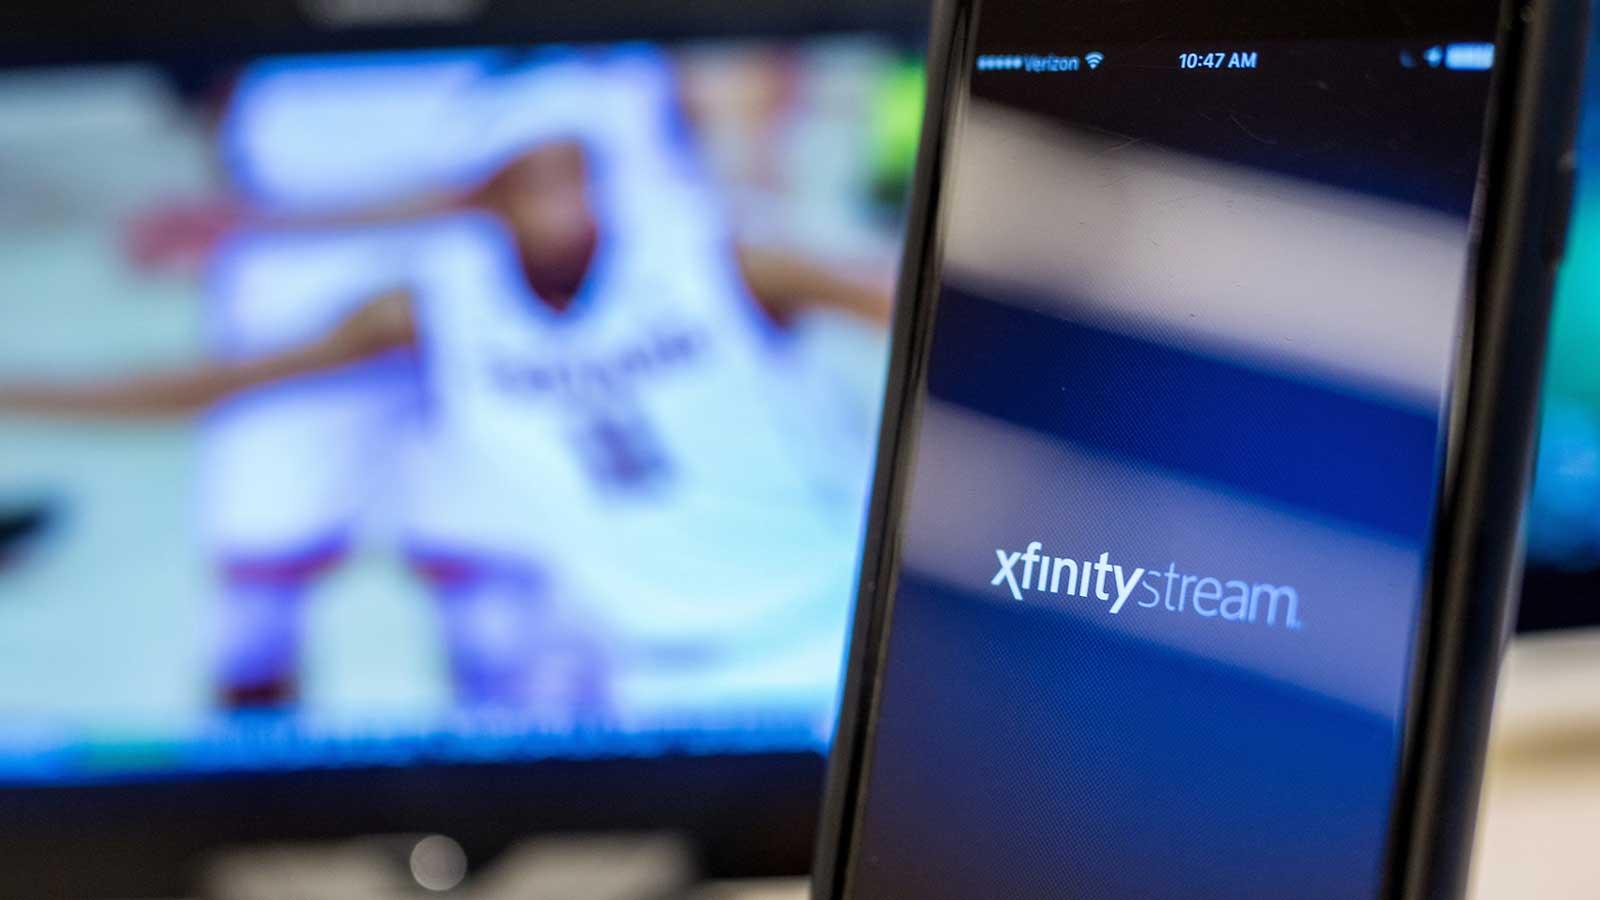 Xfinity Stream app on phone screen